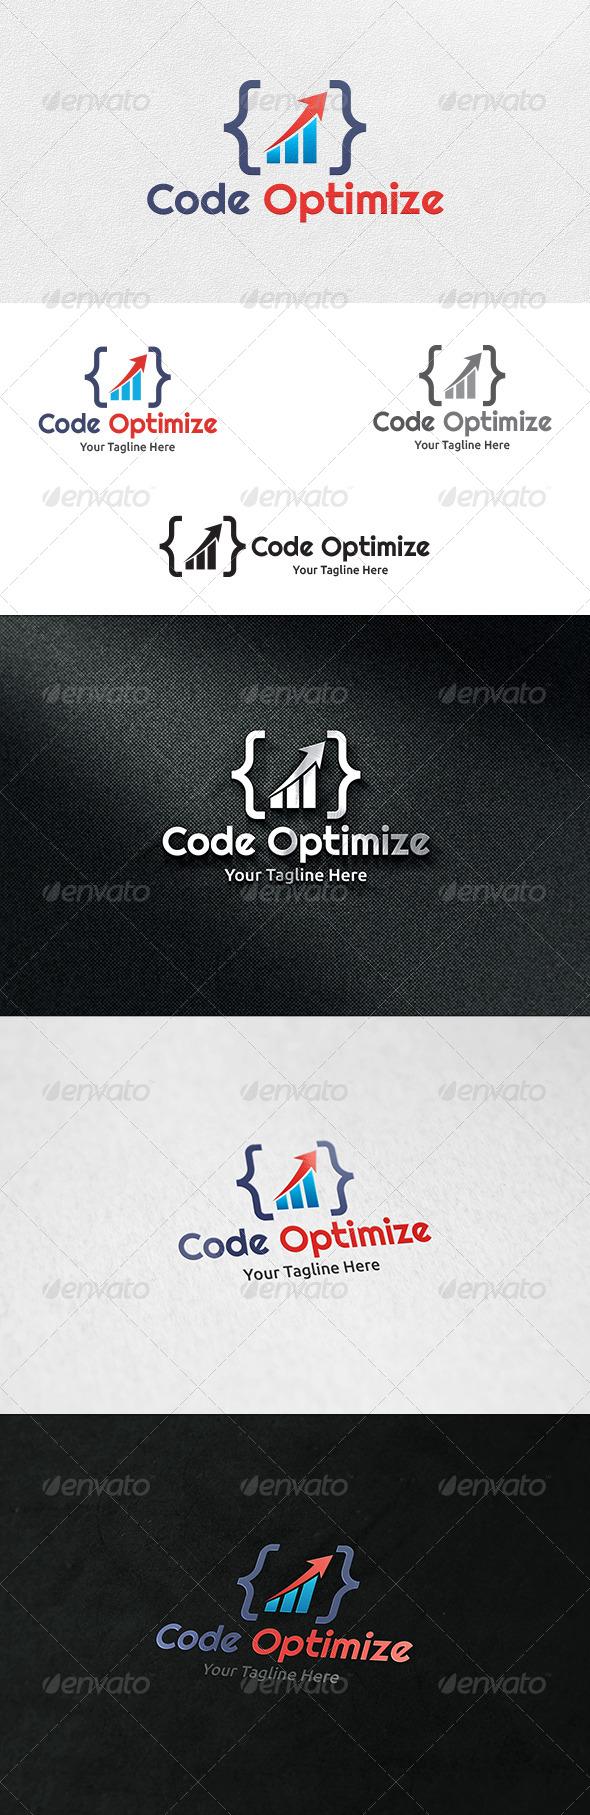 GraphicRiver Code Optimize Logo Template 6865831